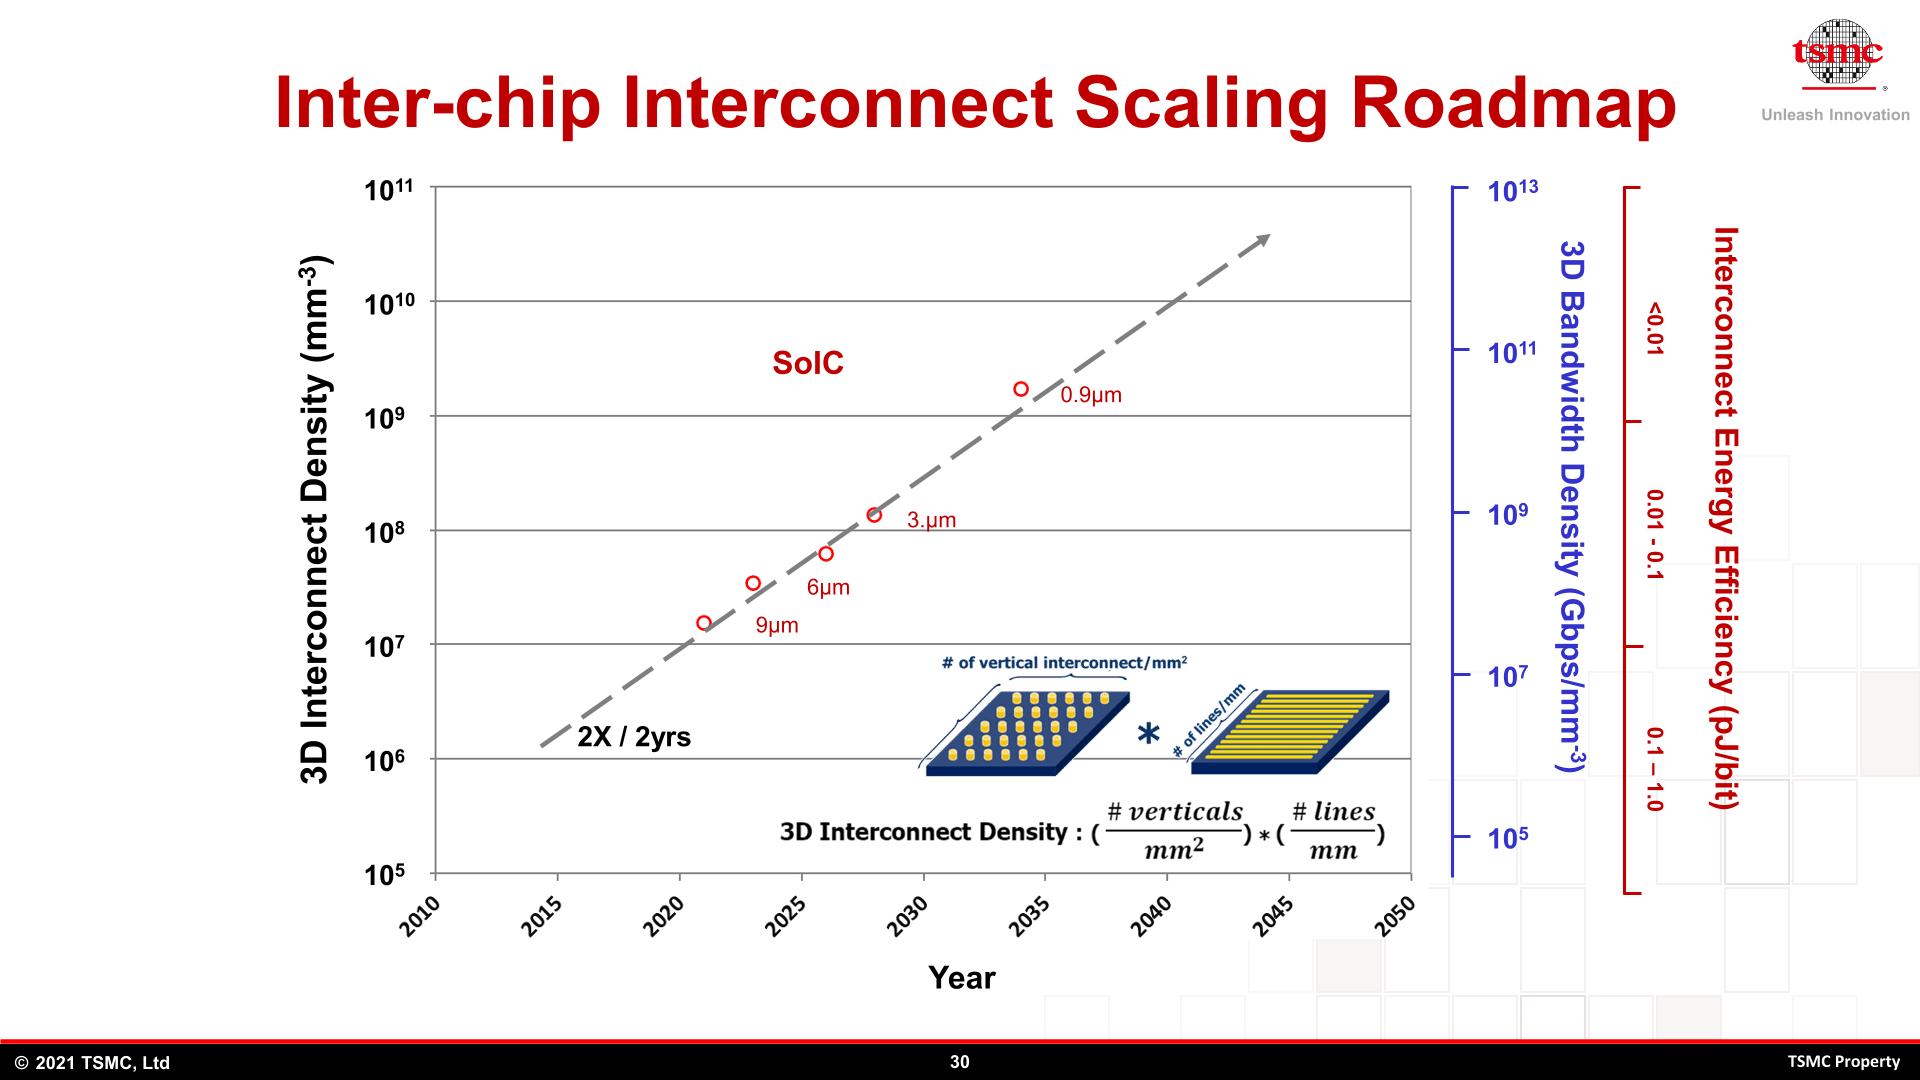 TSMCs Interconnect Scaling Roadmap